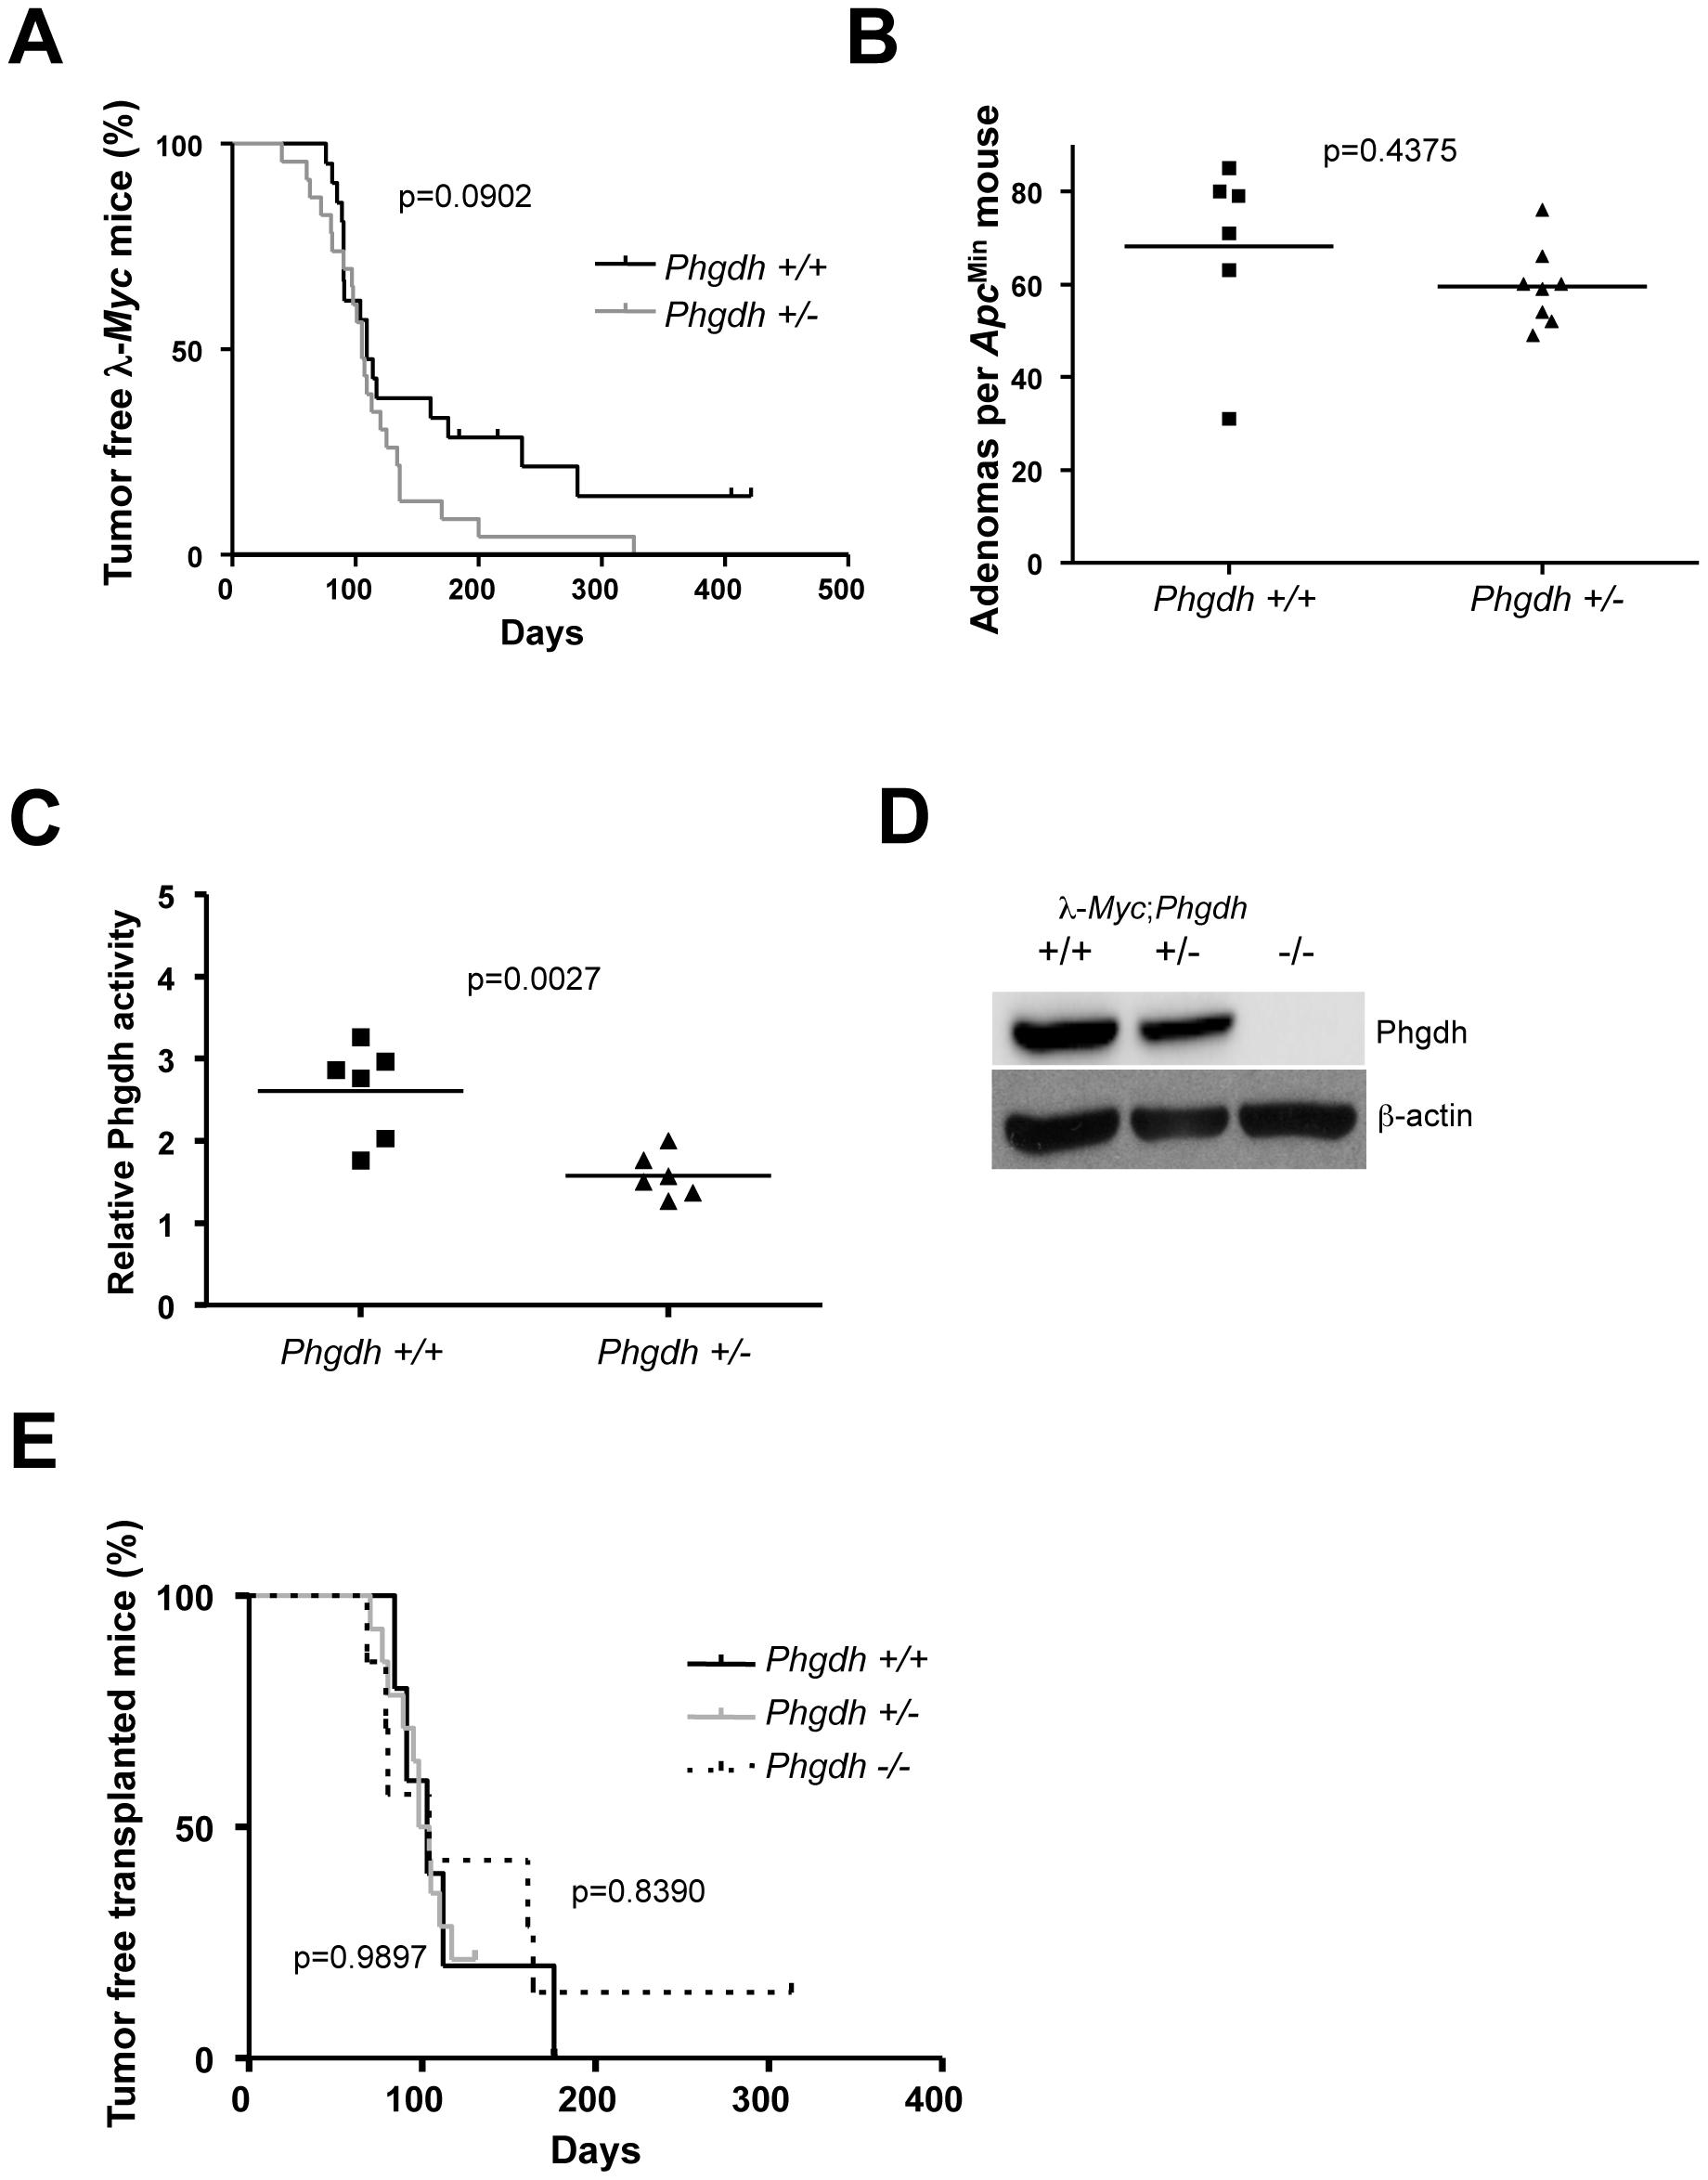 Phgdh is dispensable for lymphomagenesis in λ-<i>Myc</i> transgenic mice.